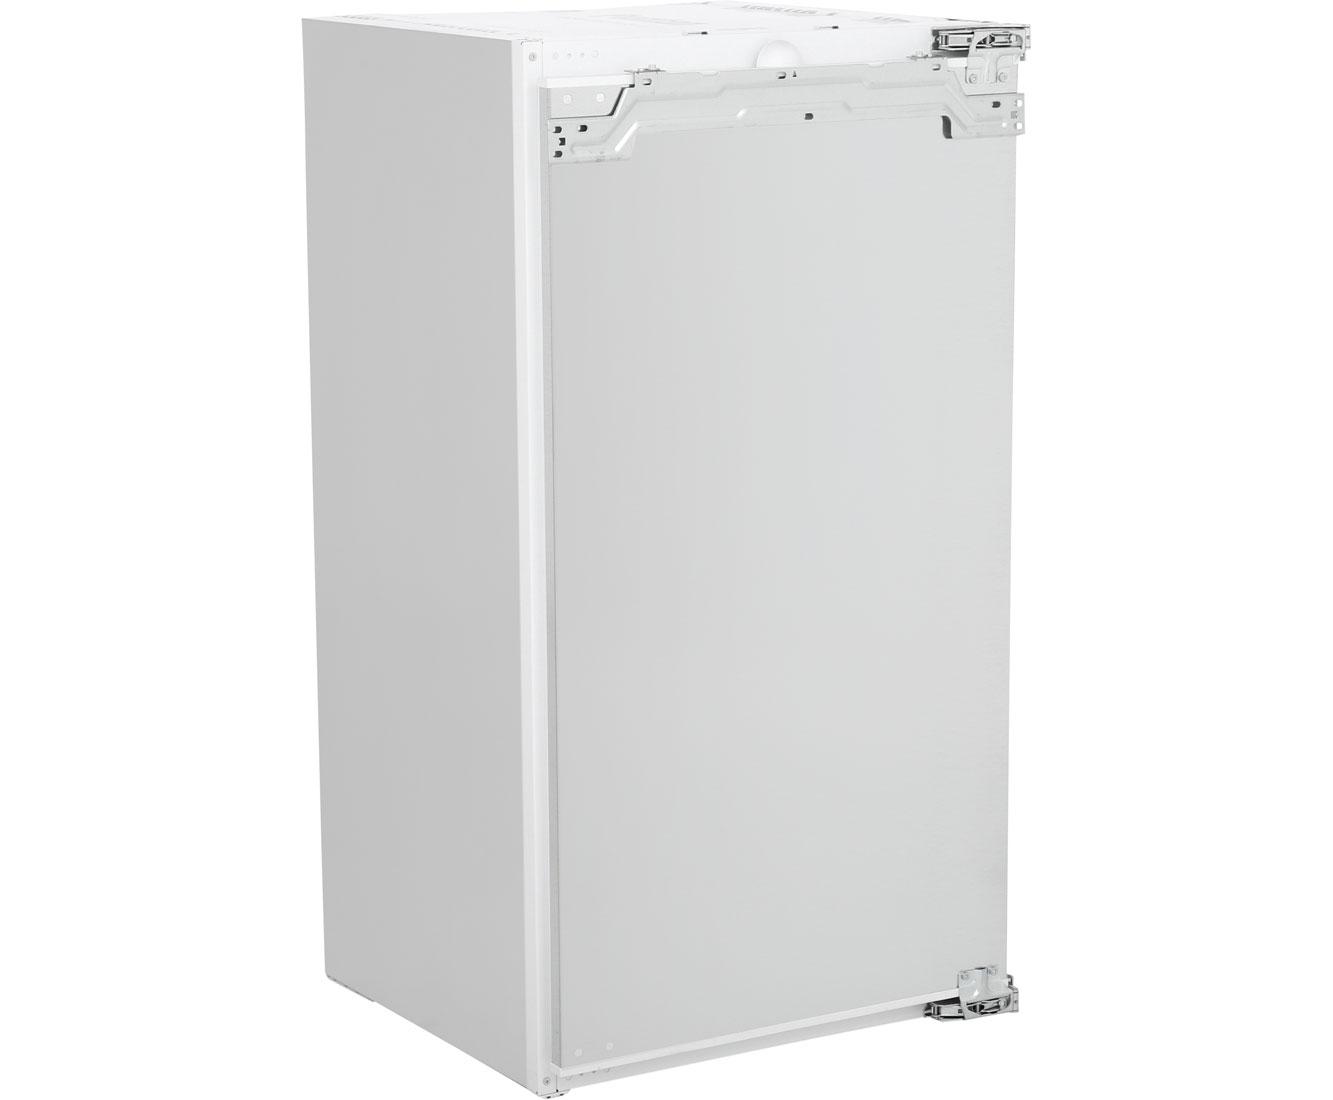 Bosch Kühlschrank Freistehend : Bosch serie kir v einbau kühlschrank er nische festtür